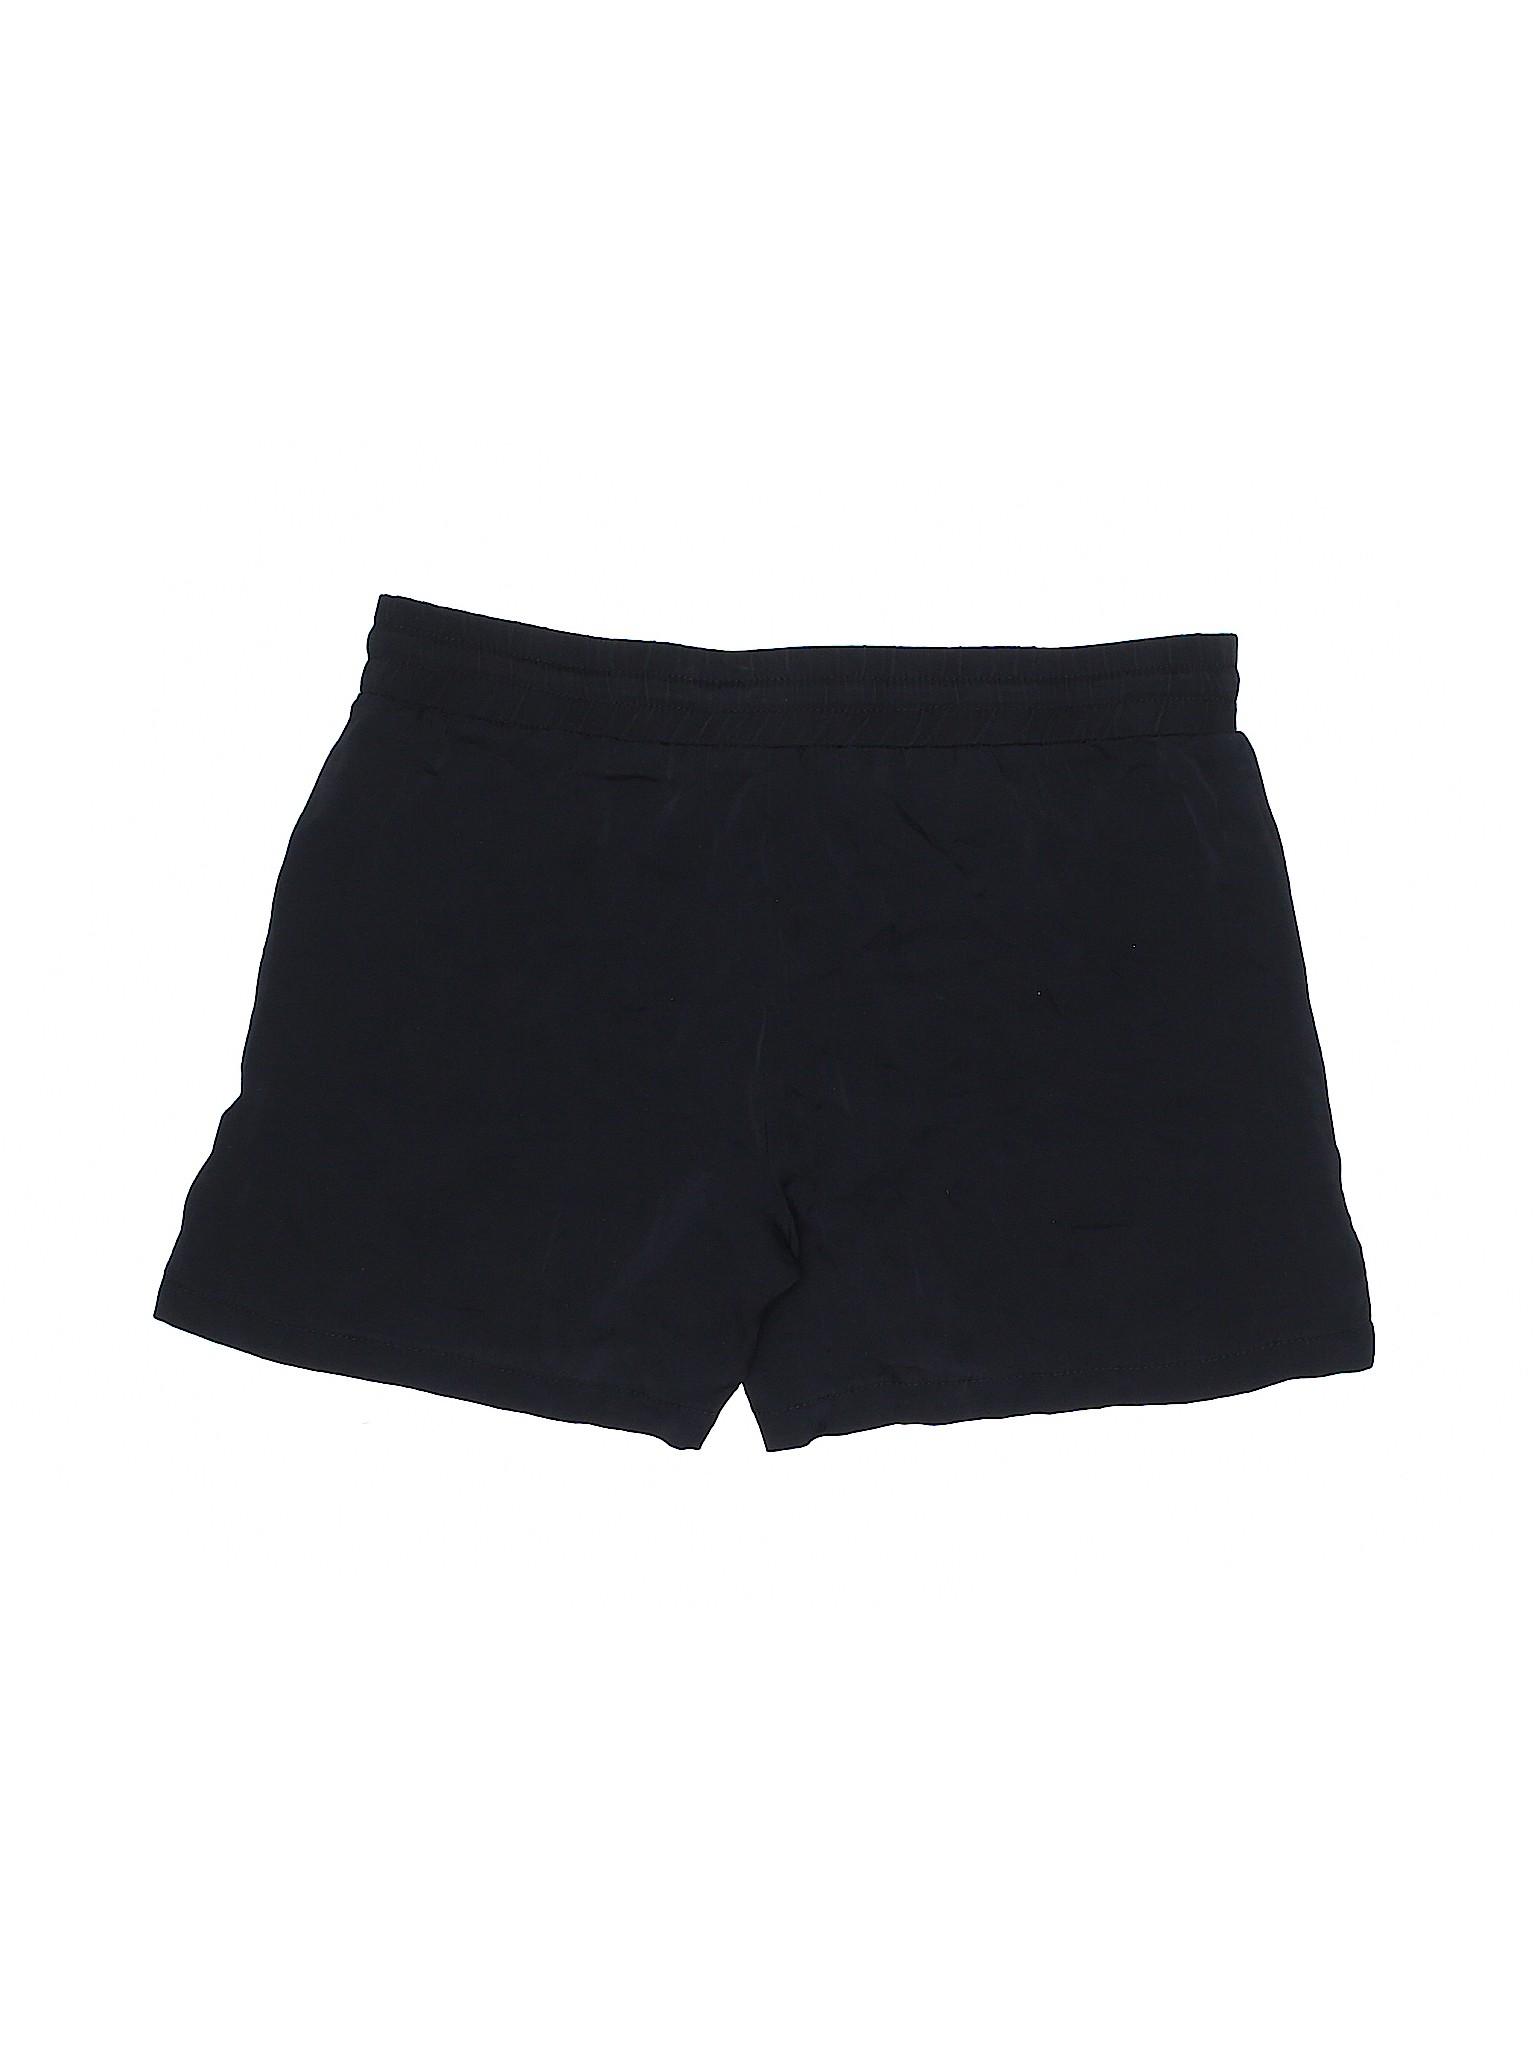 winter winter Leisure 44 Shorts winter Shorts Bailey Bailey Shorts Leisure Bailey Leisure Bailey 44 winter Leisure 44 Ow1Sw